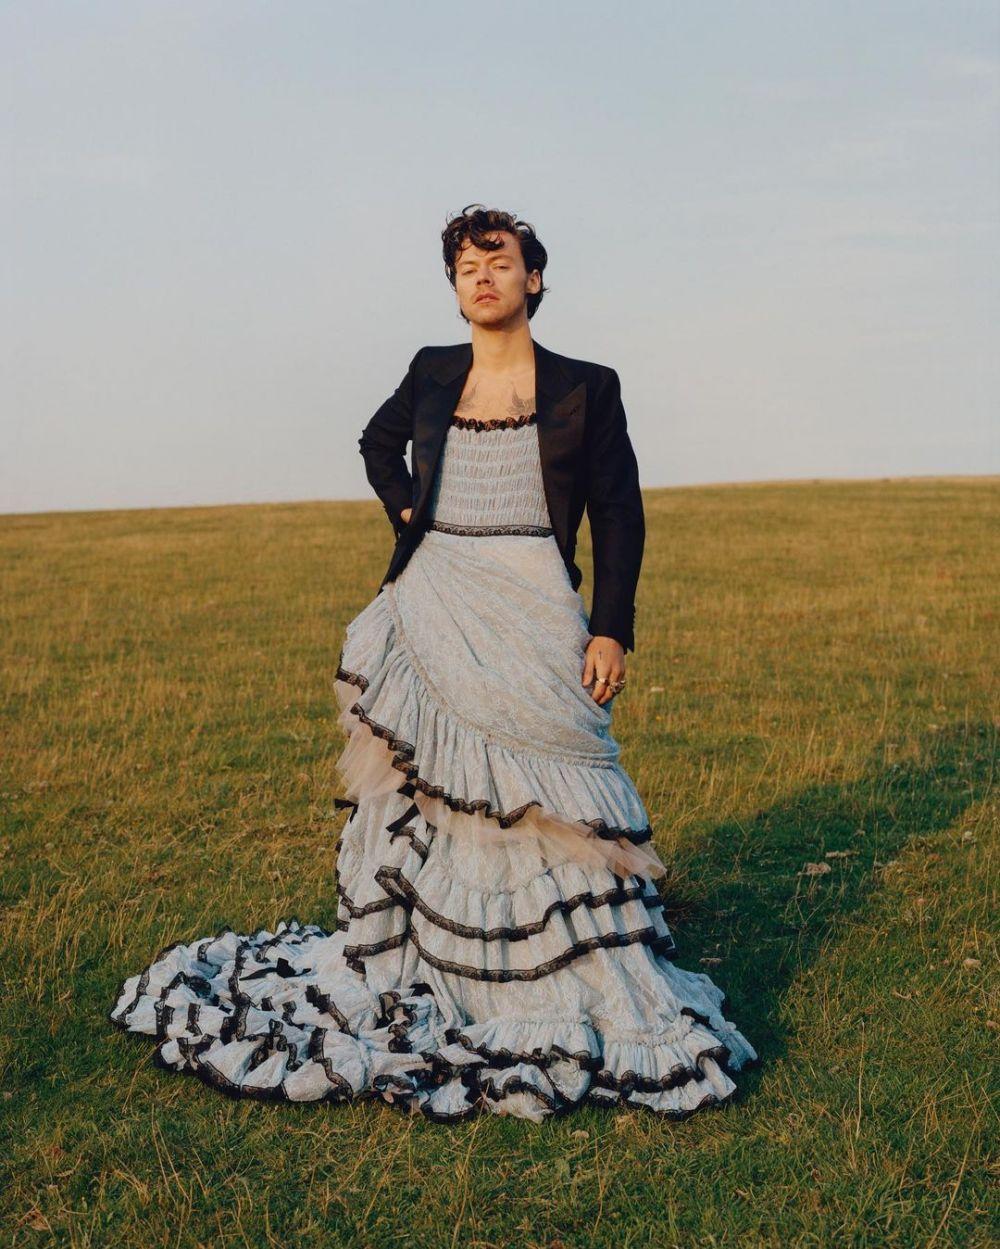 Potret Harry Styles kenakan gaun di majalah Vogue Instagram